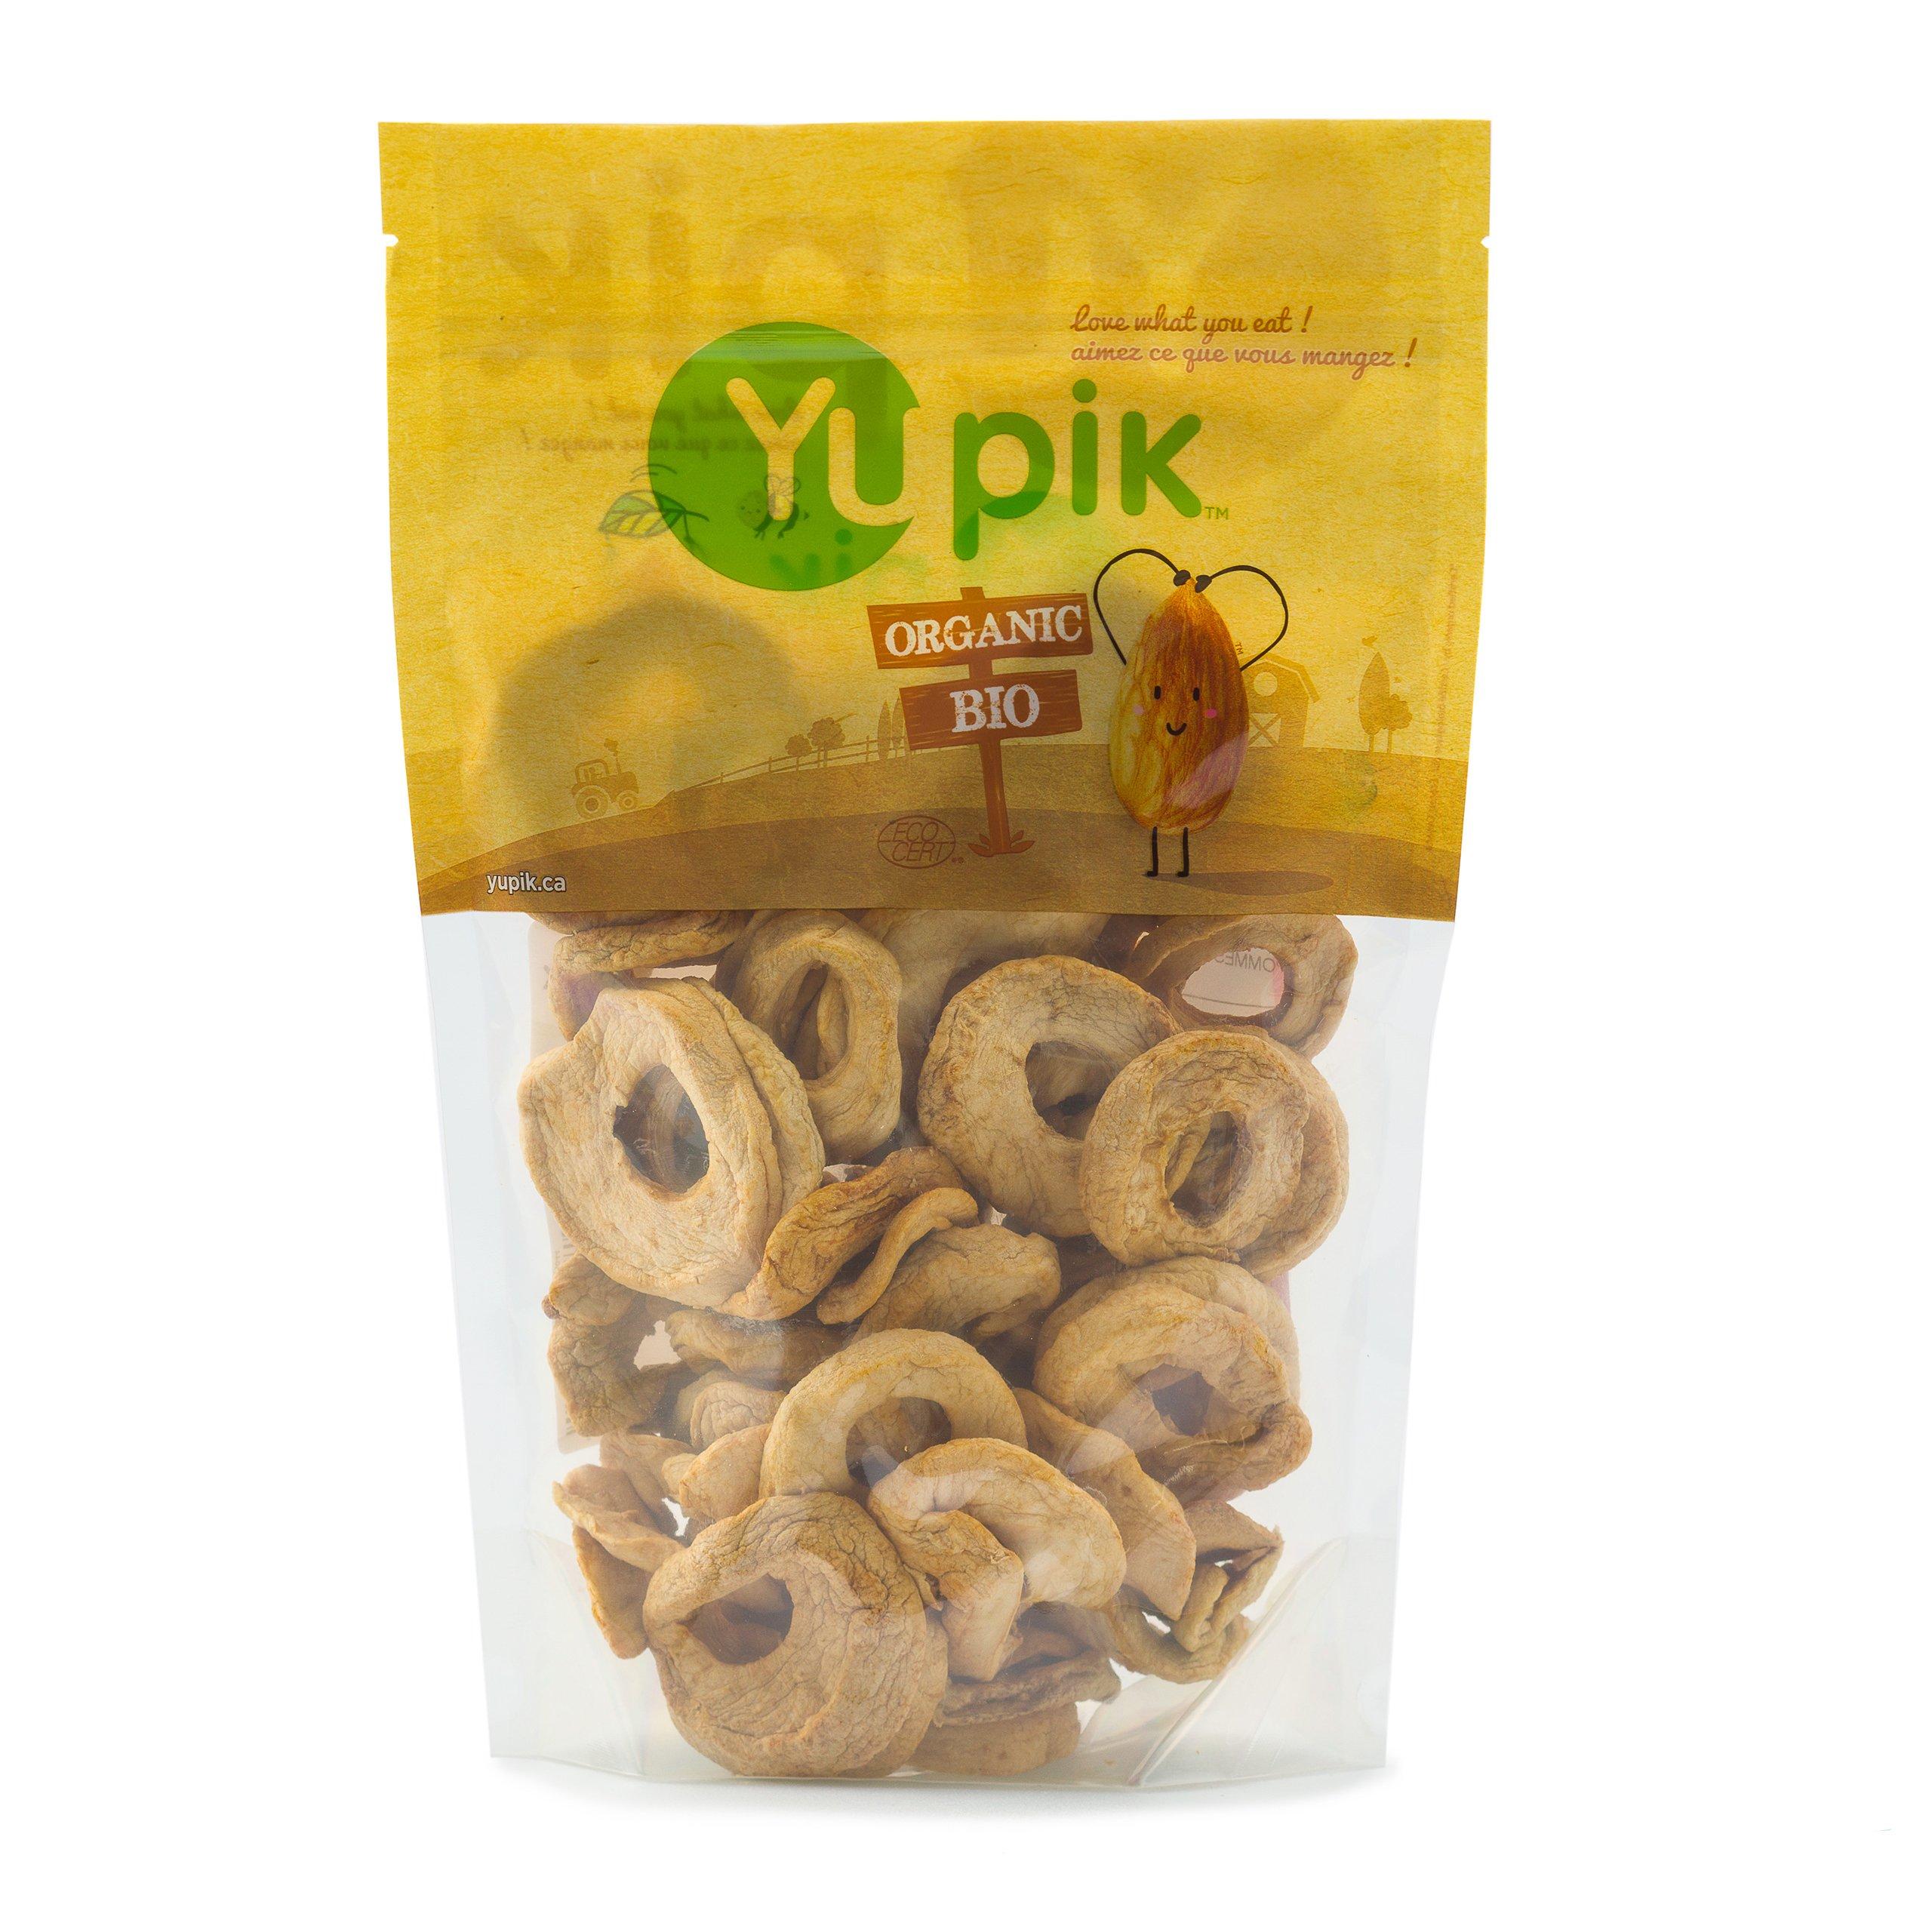 Yupik Organic Dried Soft Apple Rings, 1 Lb by Yupik